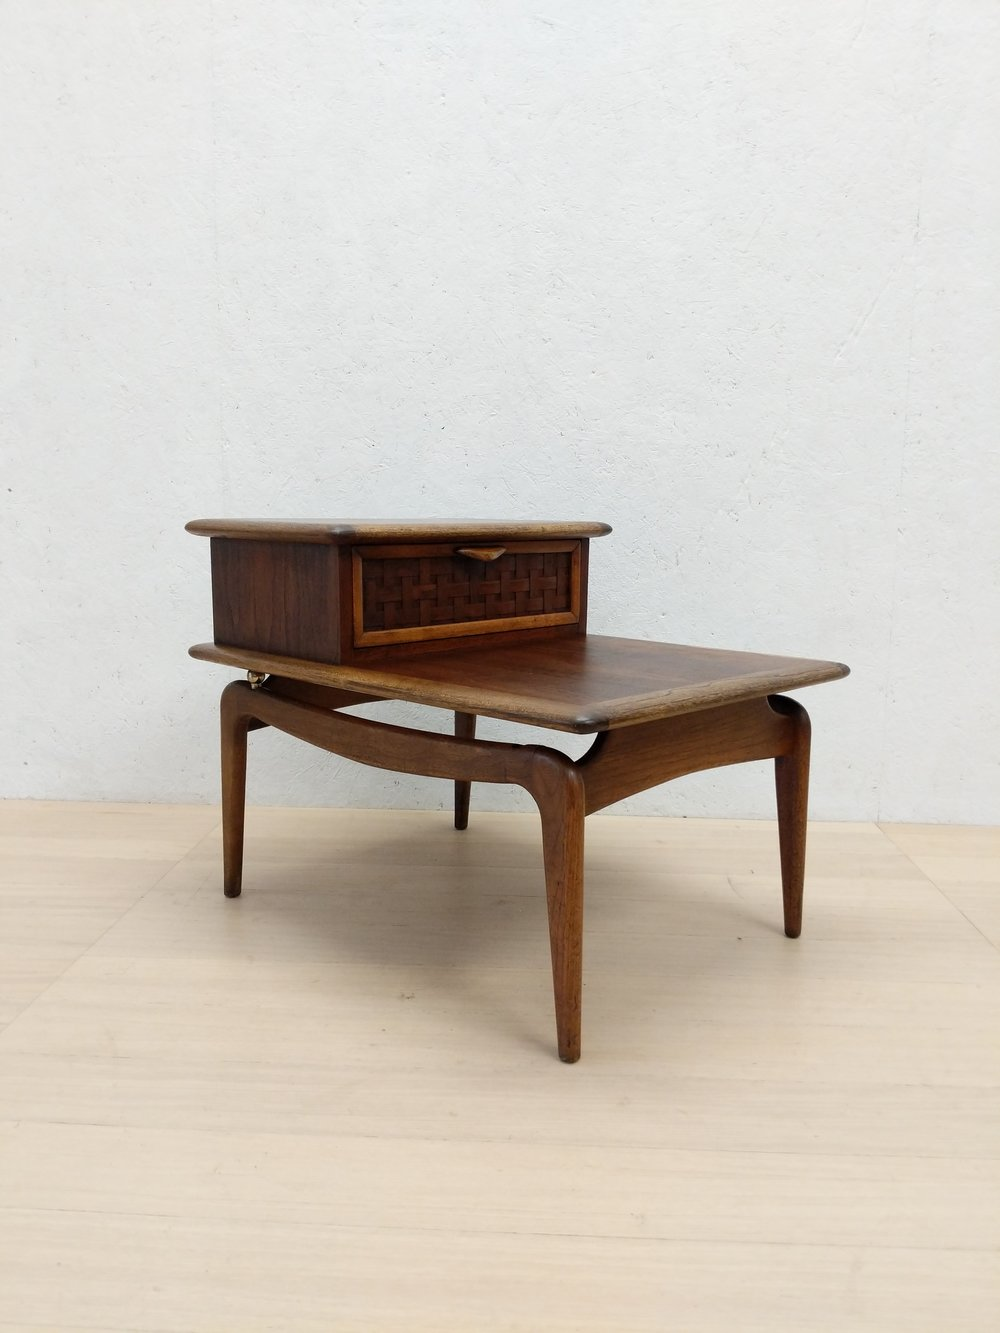 Vintage Mid Century Modern Lane Side Table Nightstand Far Out Finds Vintage Scandinavian Furnishings